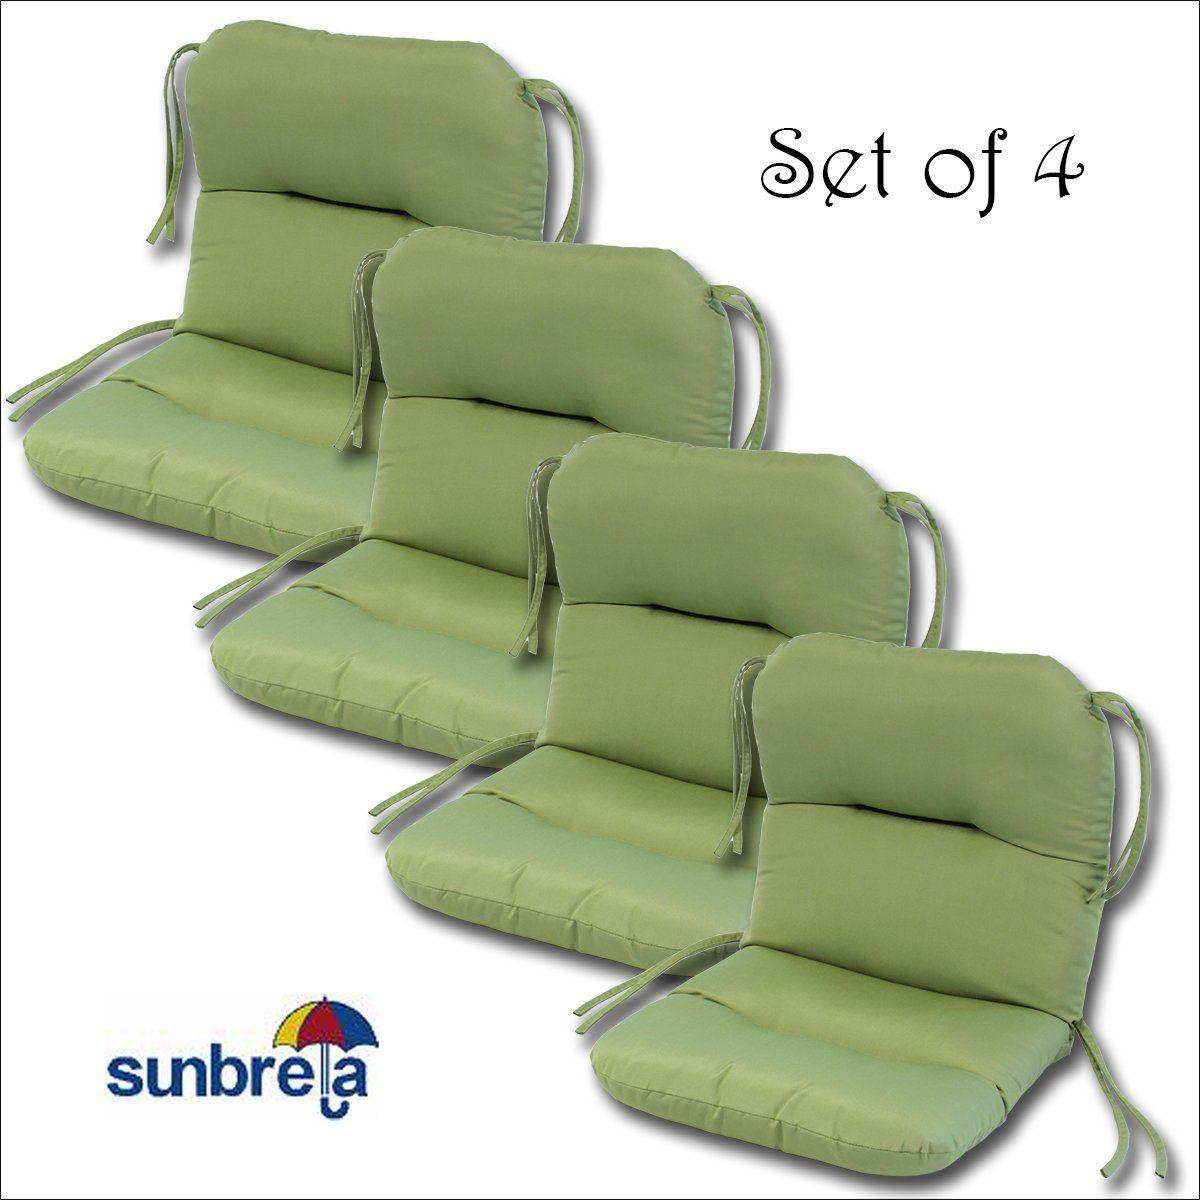 Set Of 4 Outdoor Chair Cushions 20 X 36 X 3 H 19 In Sunbrella